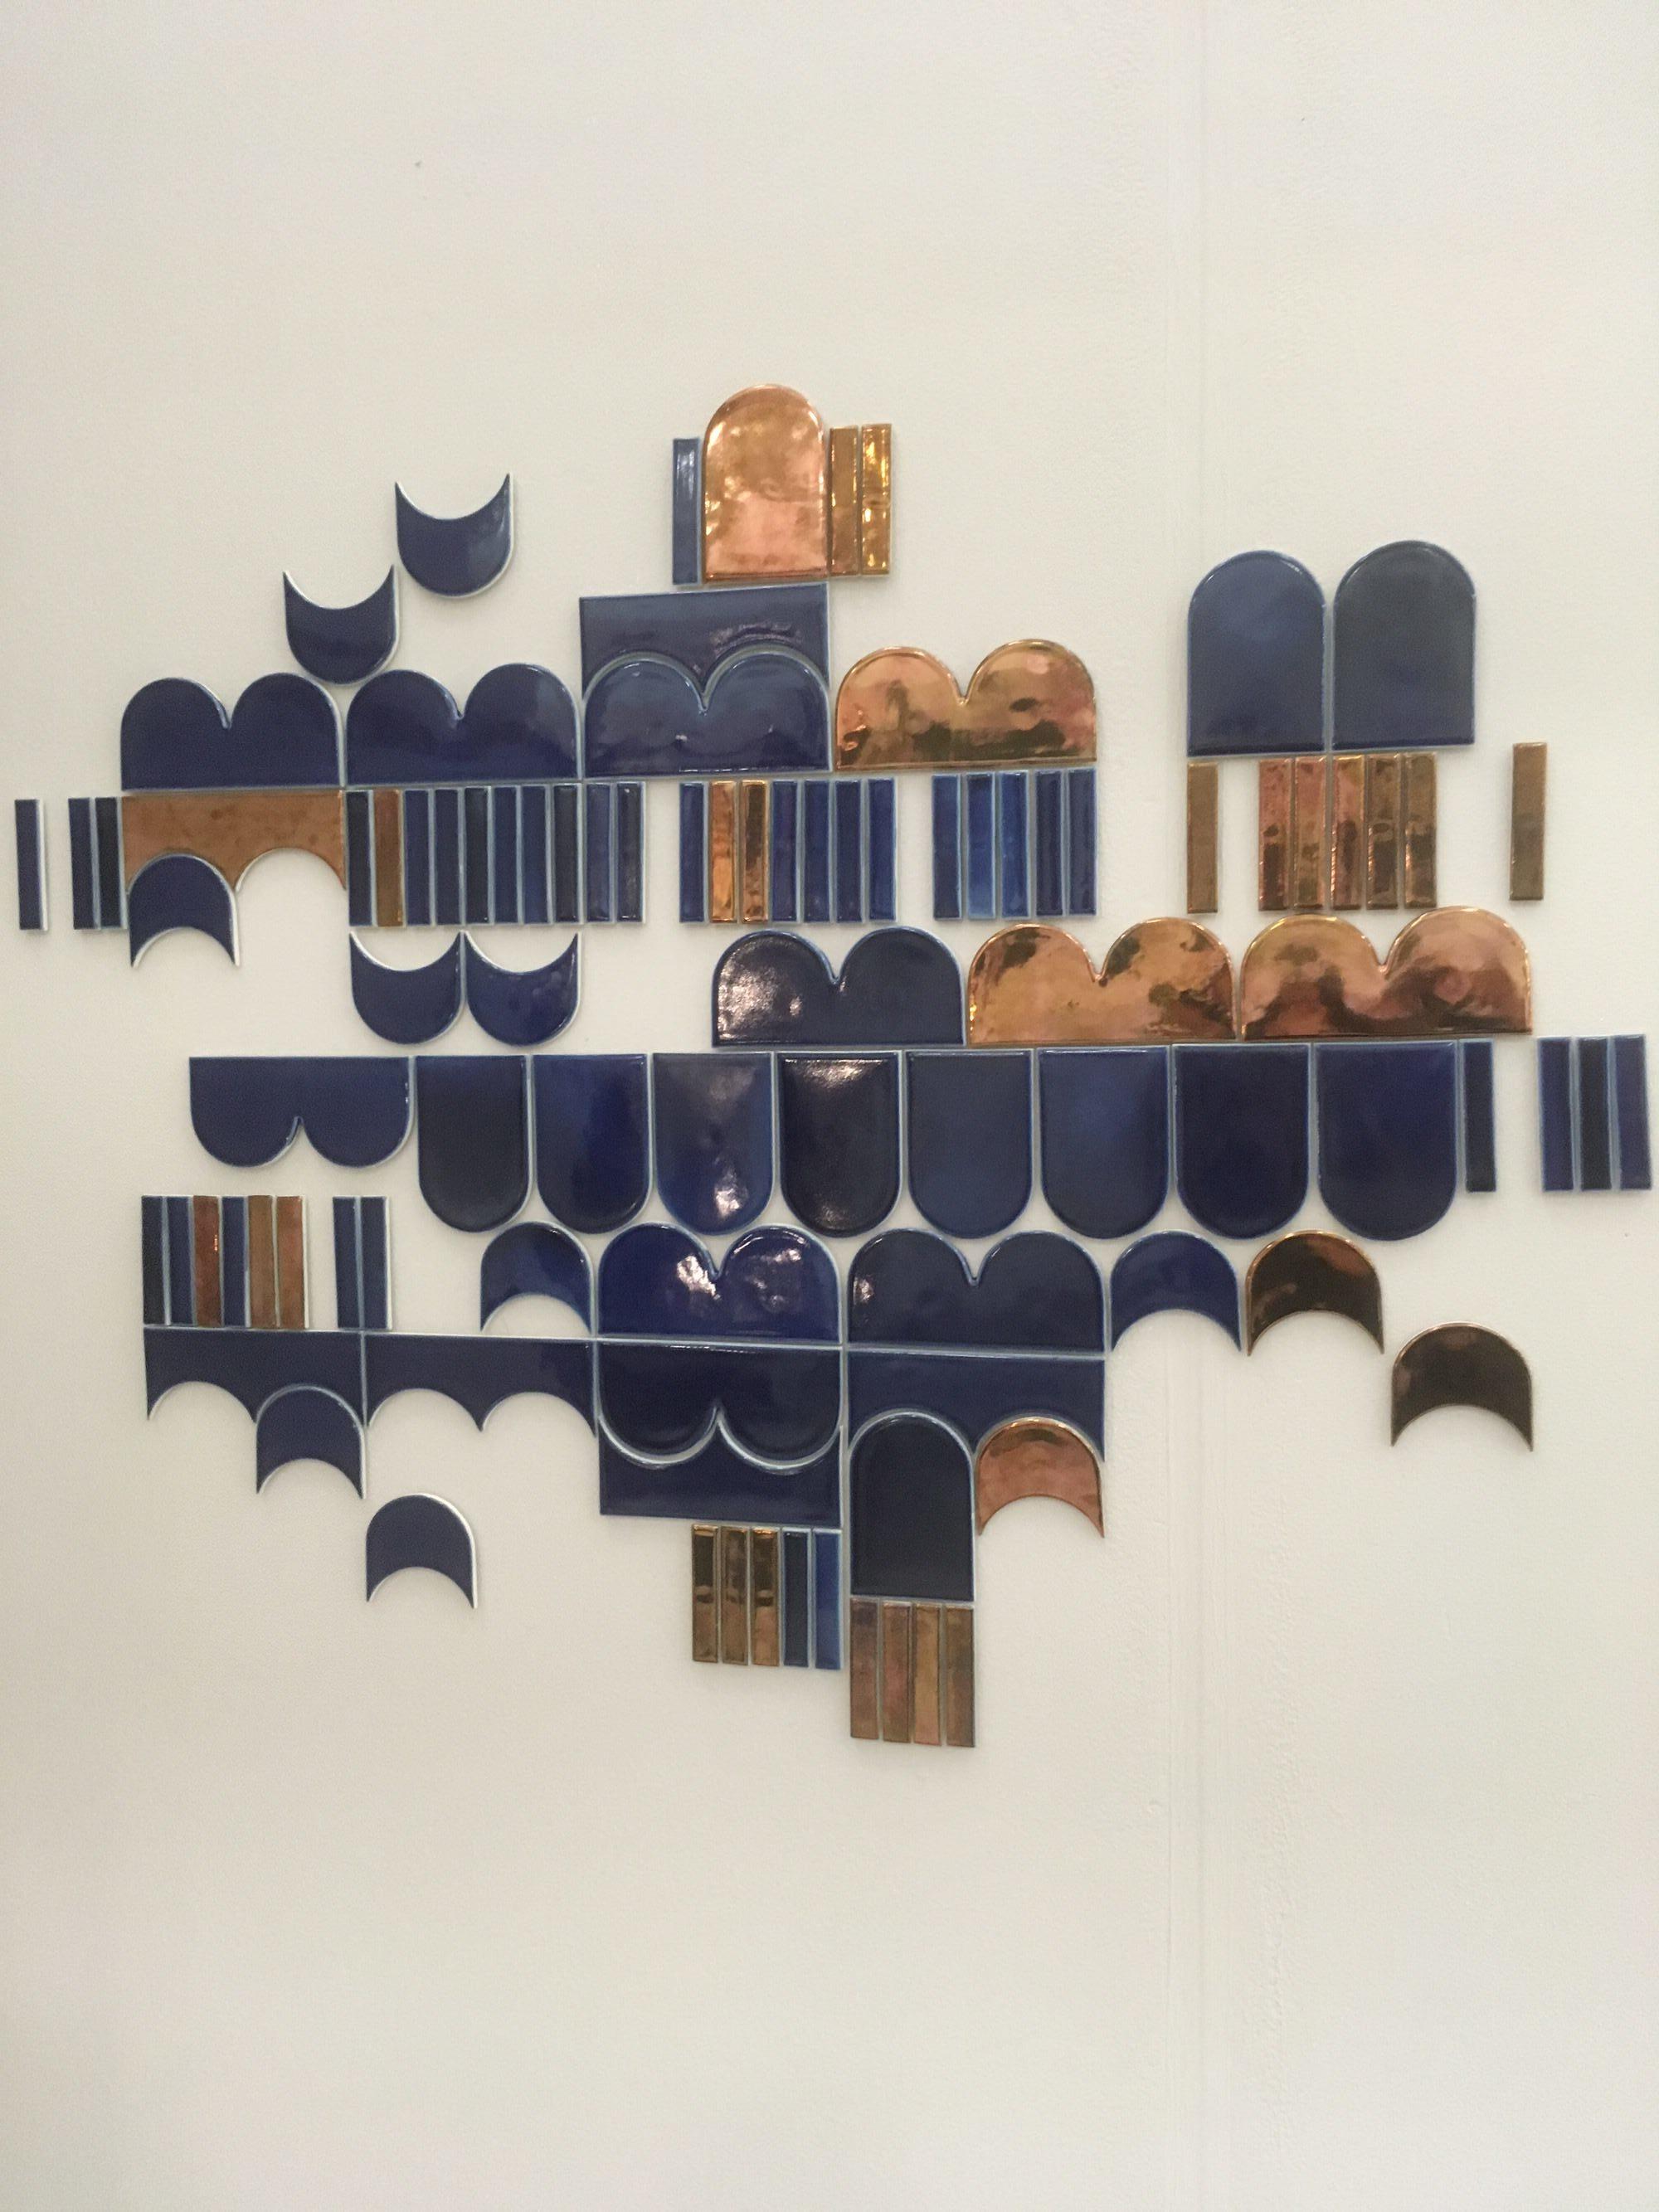 a beautiful tile arrangement by @laura_ittkonen